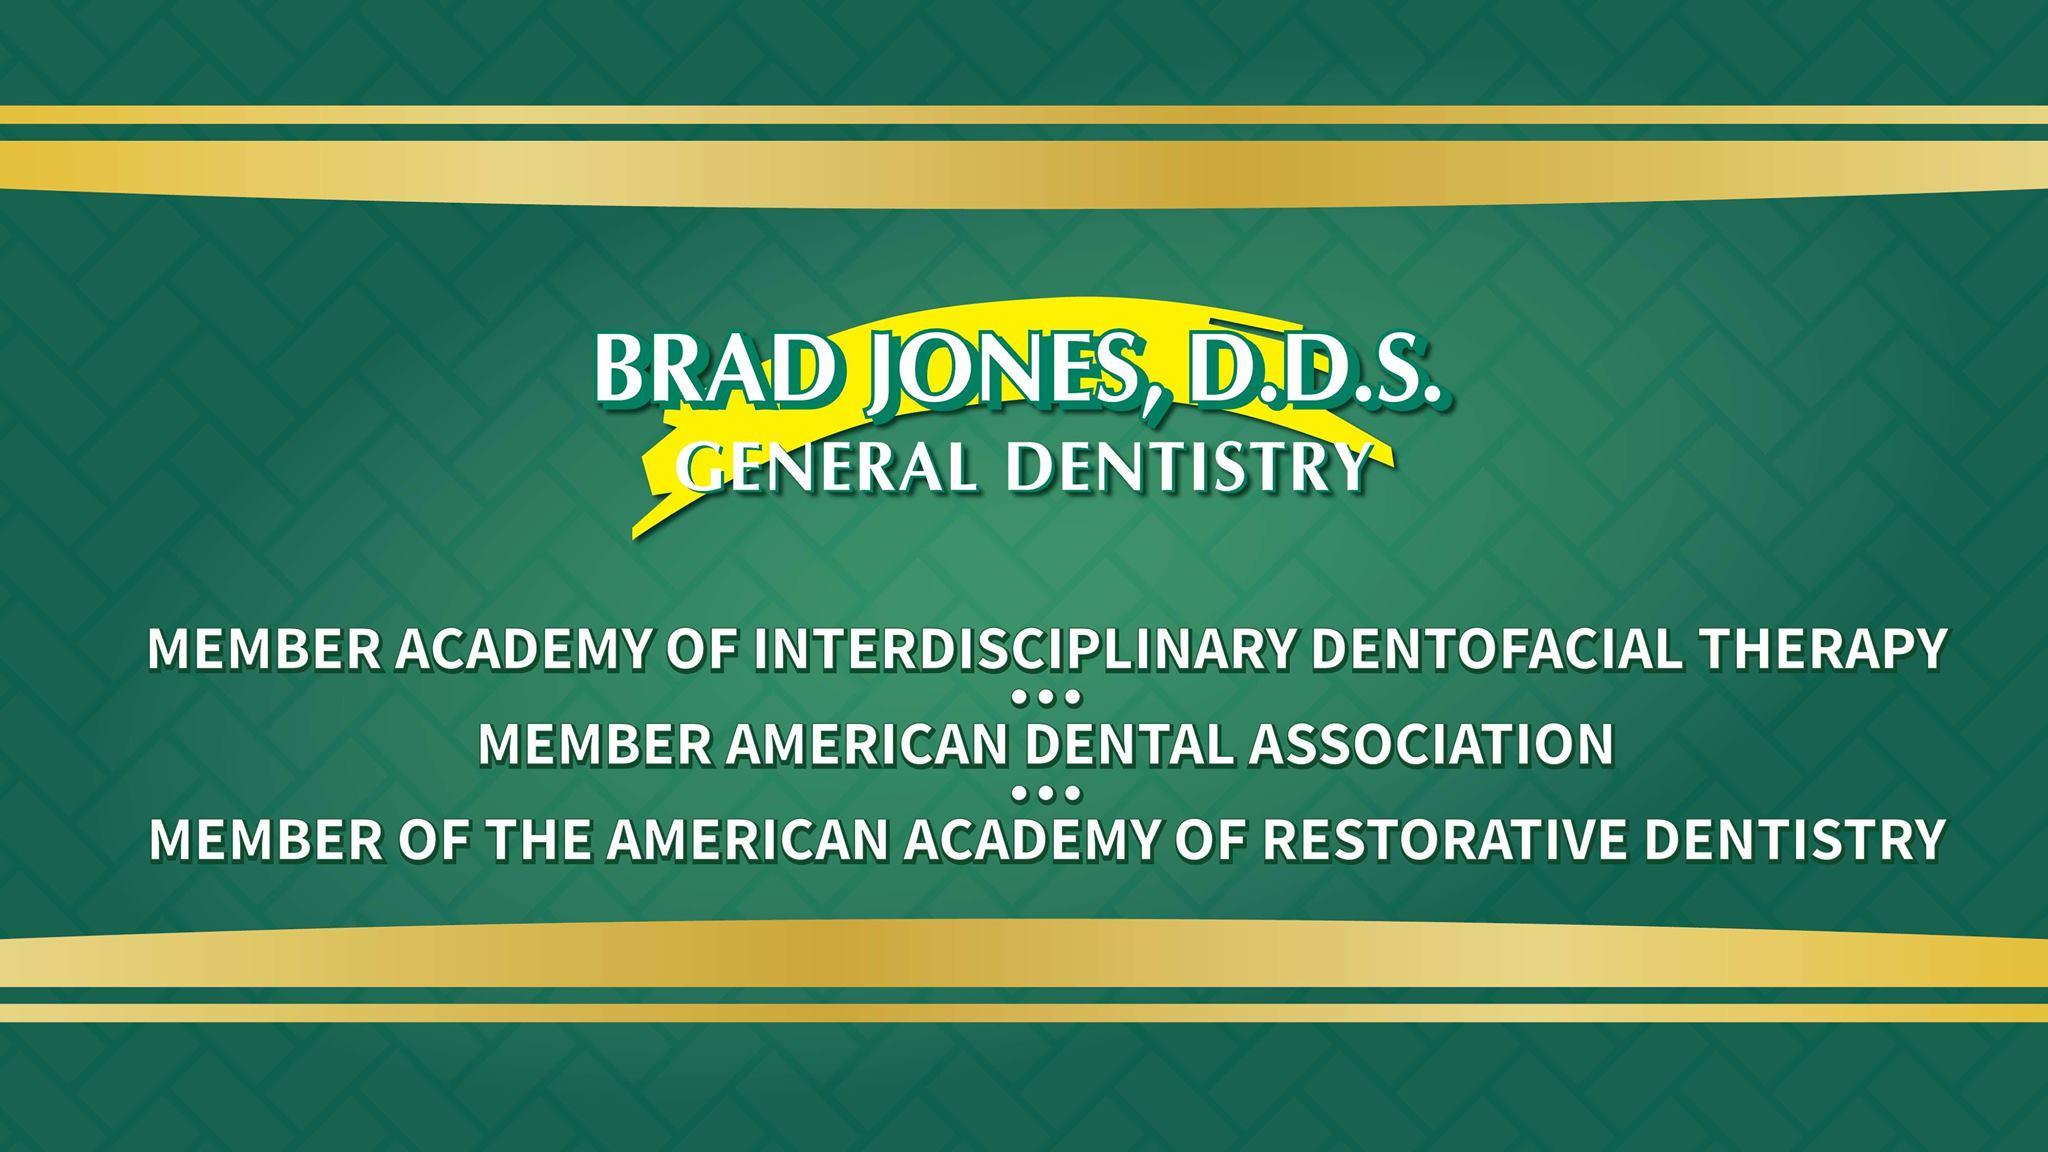 Brad Jones DDS Jack Pardo DDS General Dentistry reviews | Cosmetic Dentists at 2662 E Joyce Blvd - Fayetteville AR